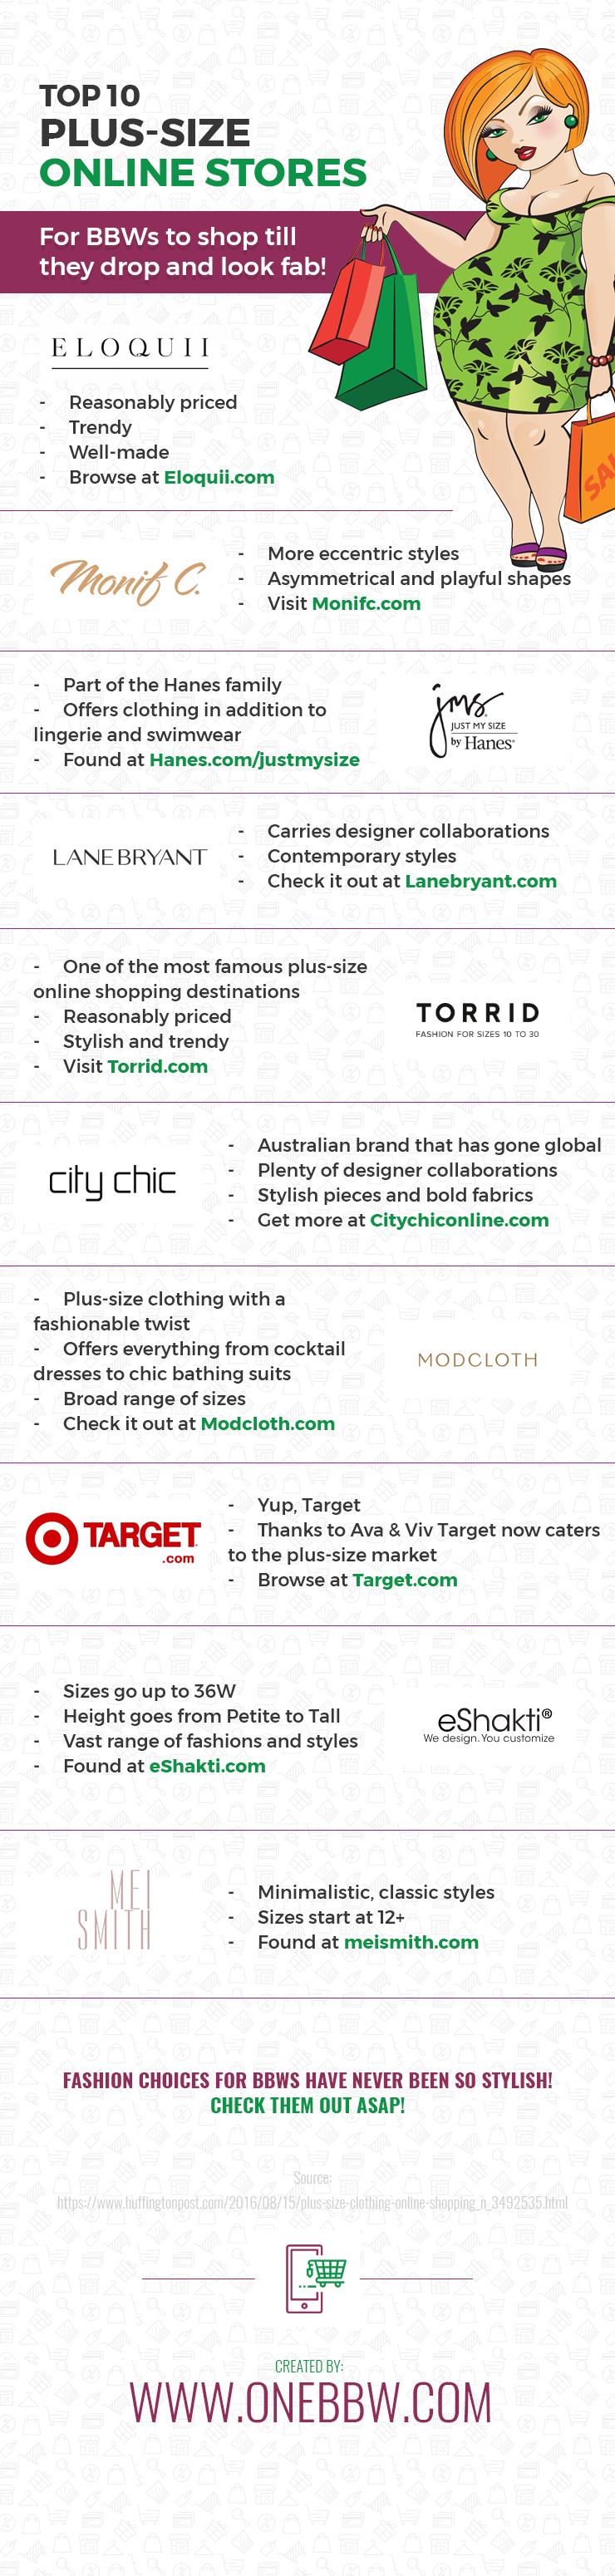 Top 10 Plus Size Online Stores